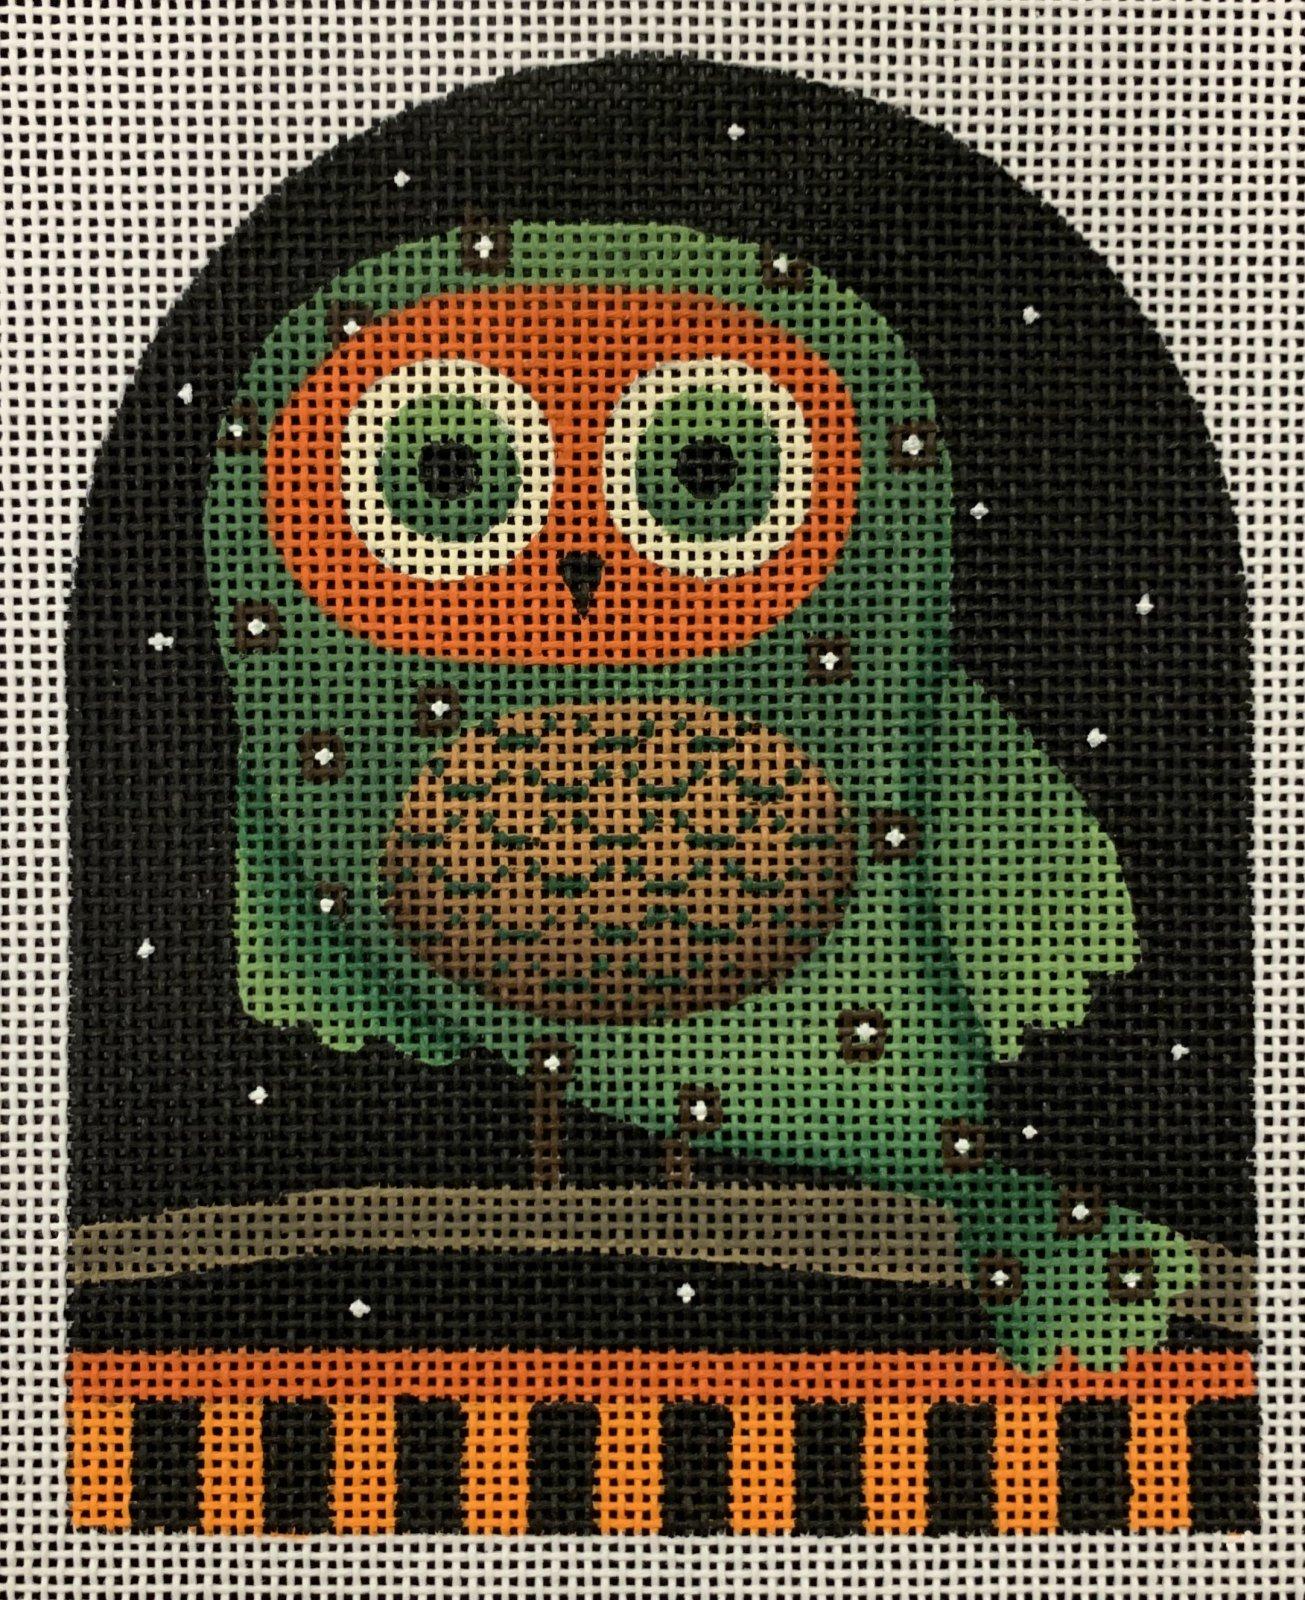 Orange-Faced Owl Dome